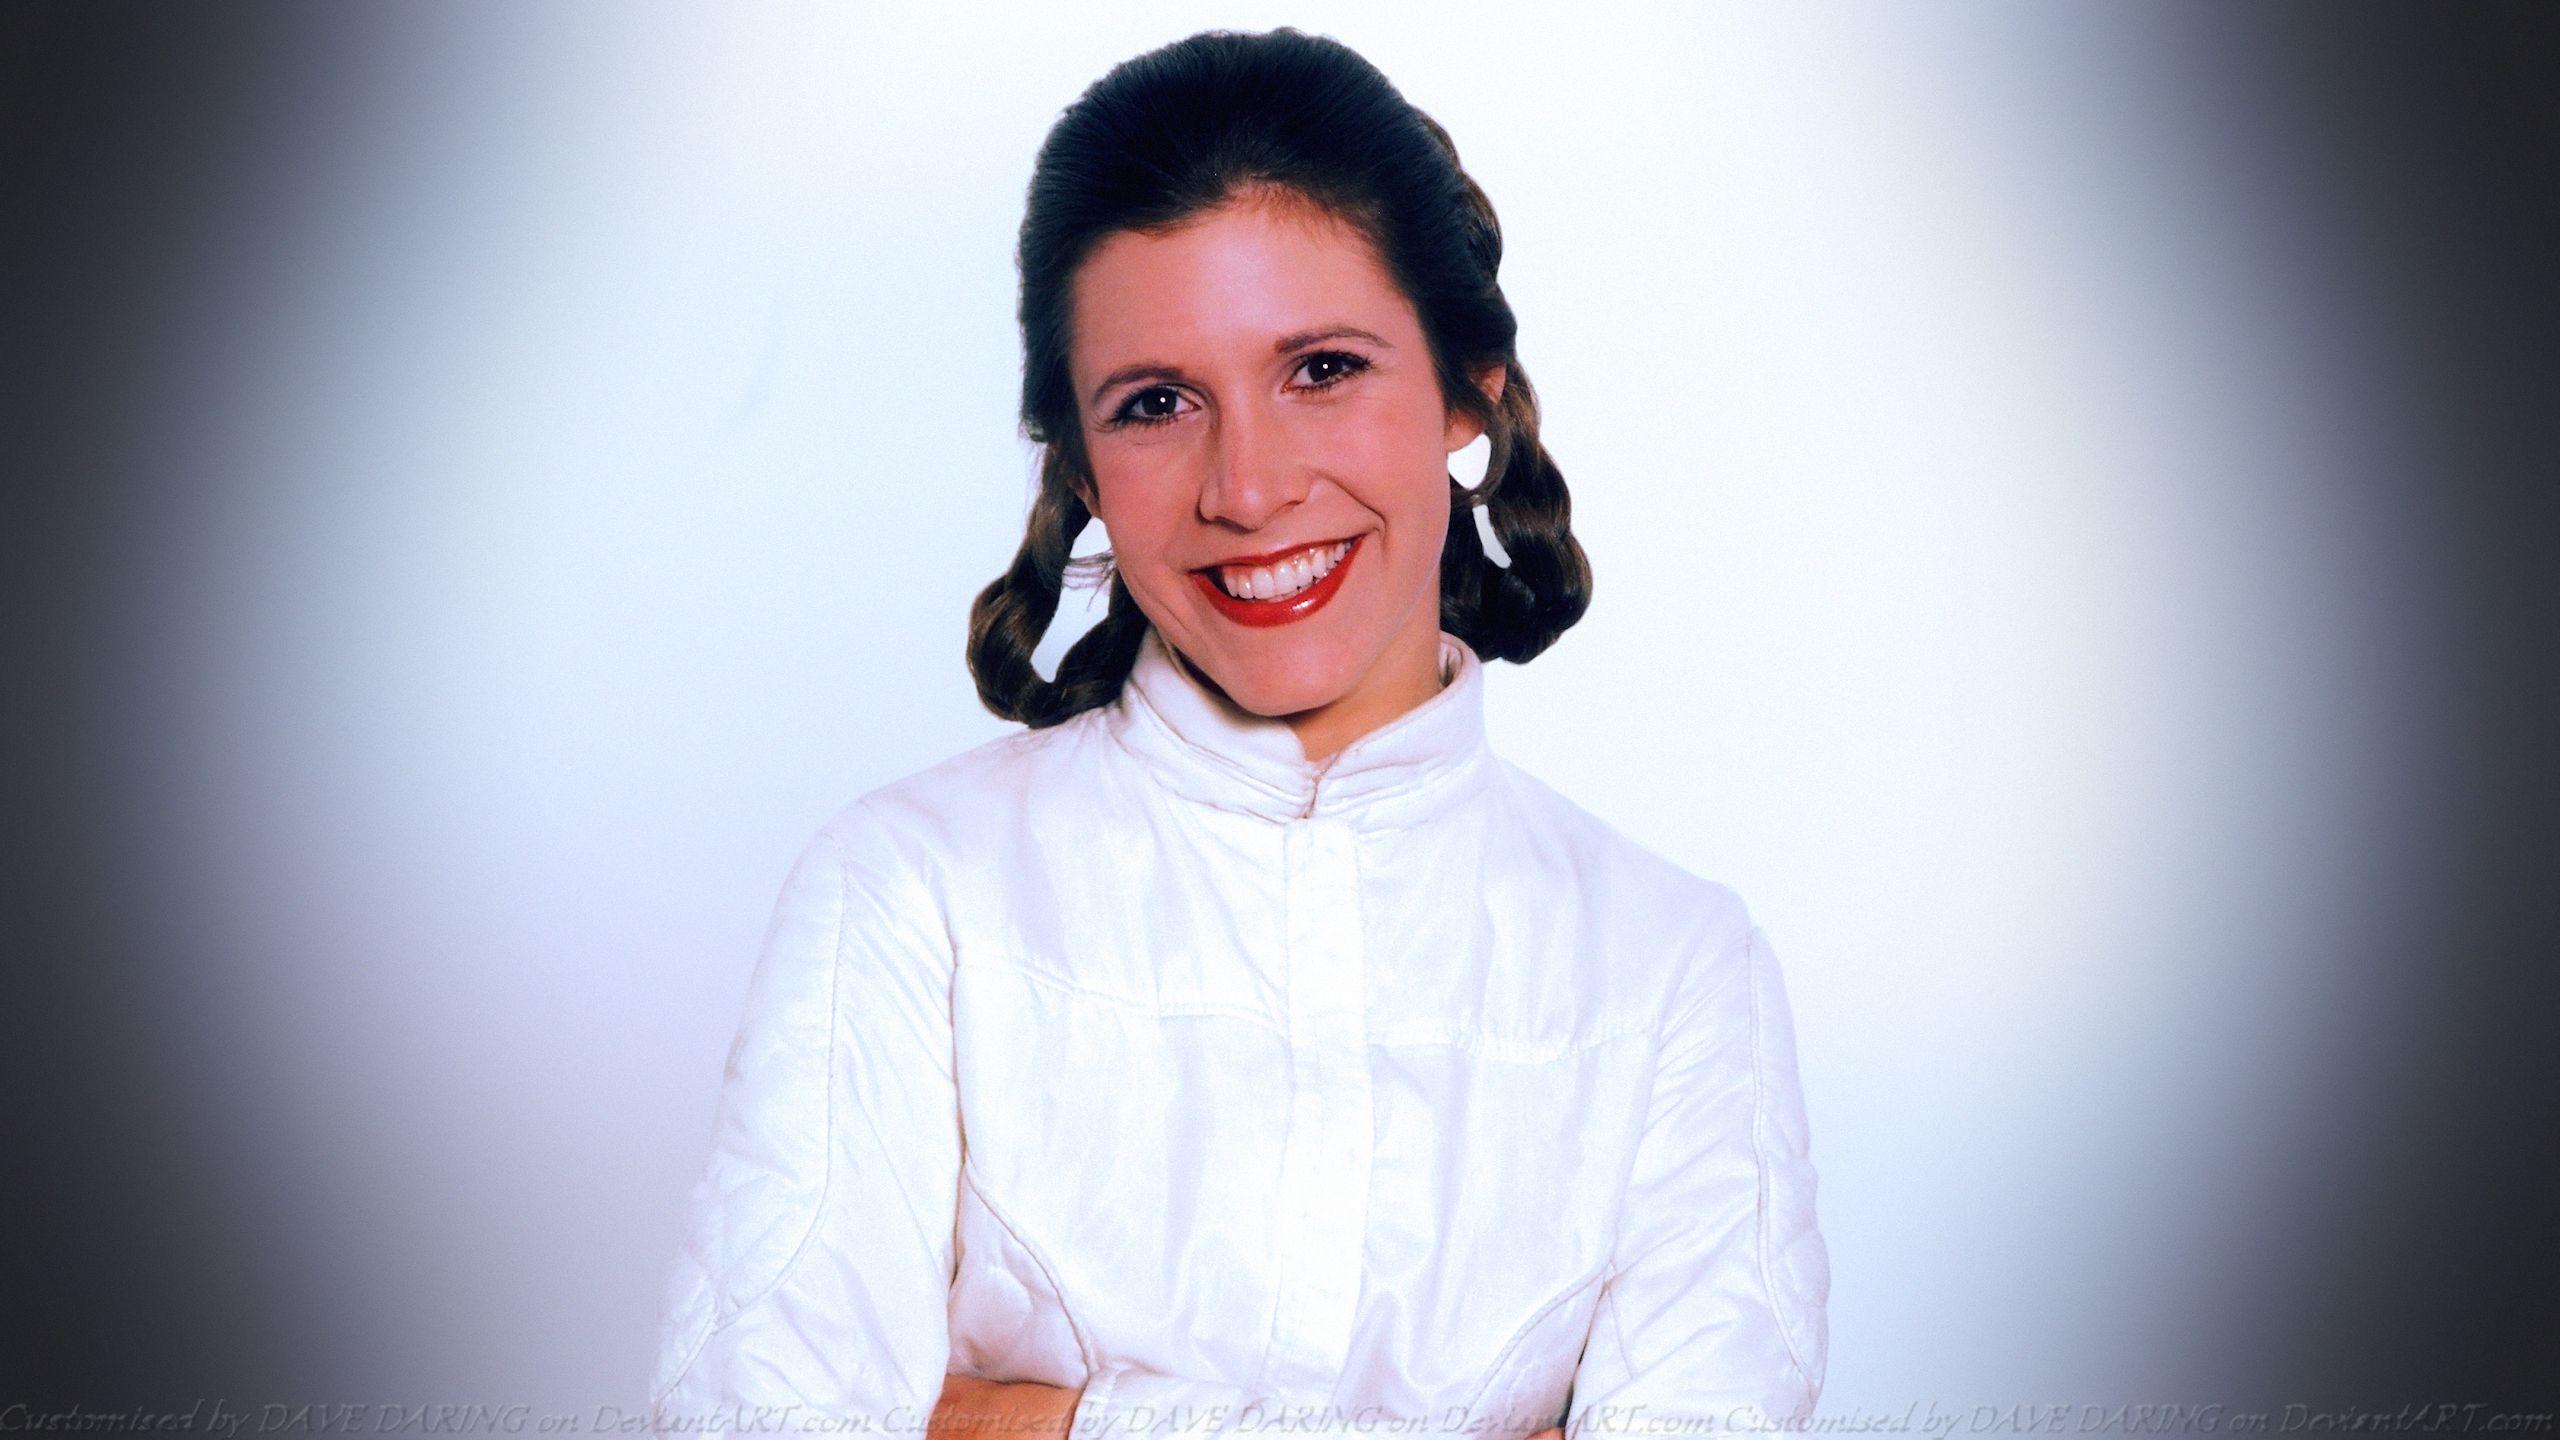 And Princess Leia Porn Carrie Fisher Princess Leia Dave Daring On Deviantart